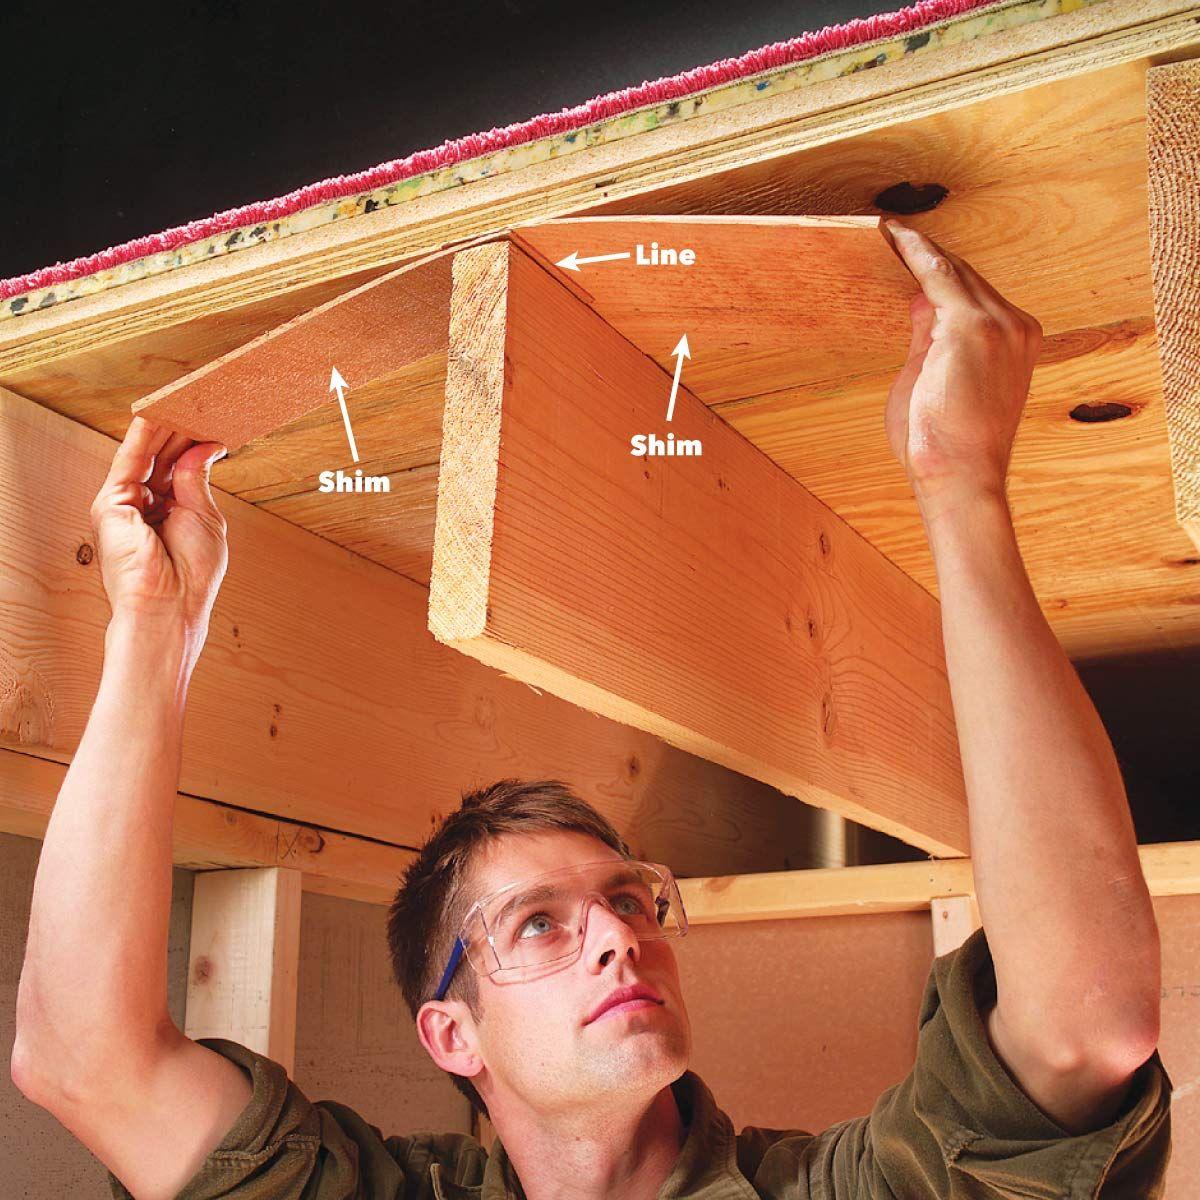 How To Fix Squeaky Floors Fix Squeaky Floors Squeaky Floors Family Handyman